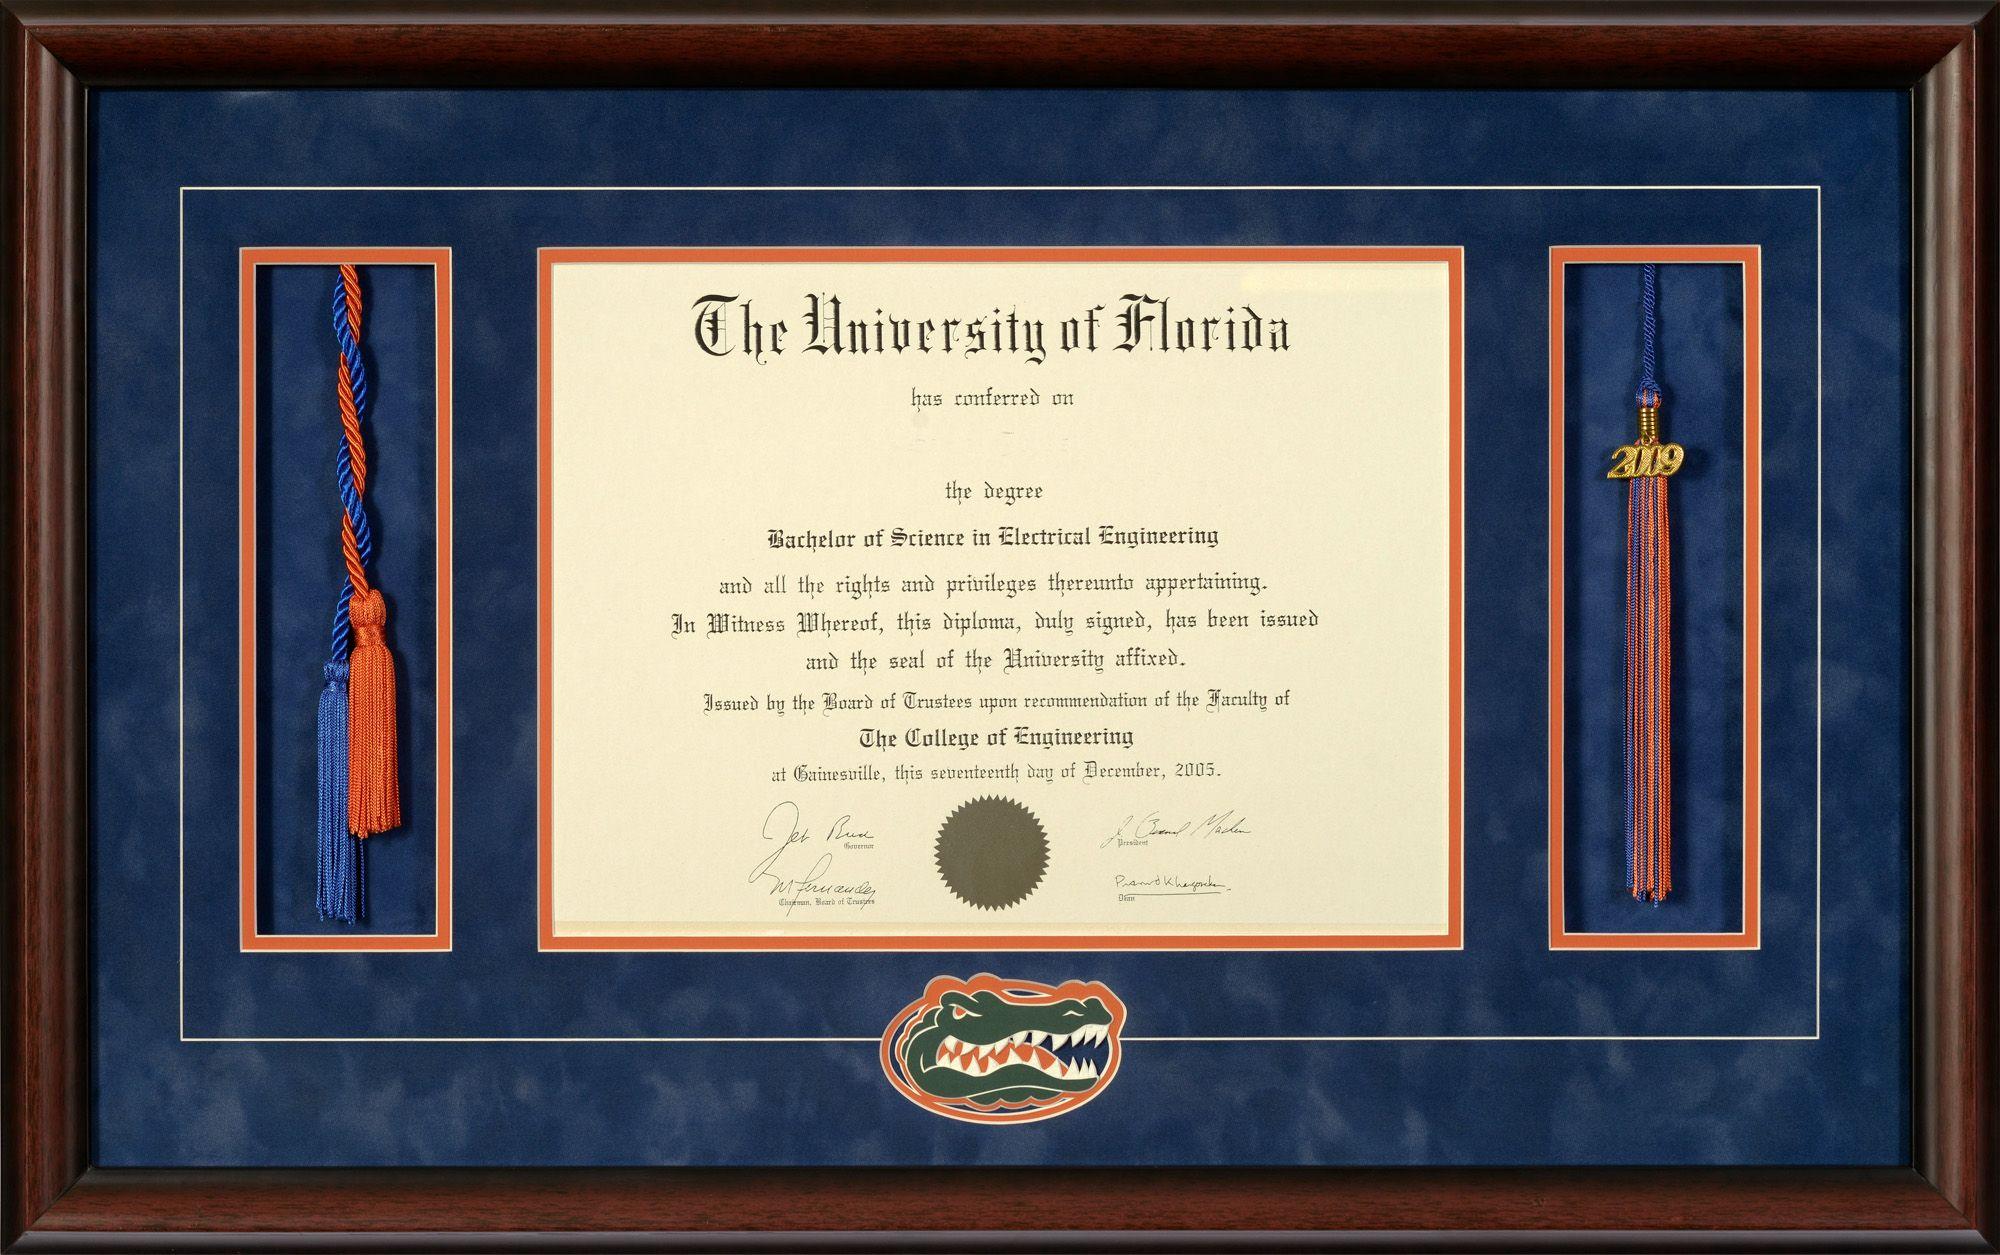 University Of Florida Diploma Frame With Honor Cords Tassel Opening Gators Head Logo Talking Walls Diploma Frame Graduation Frame Diploma